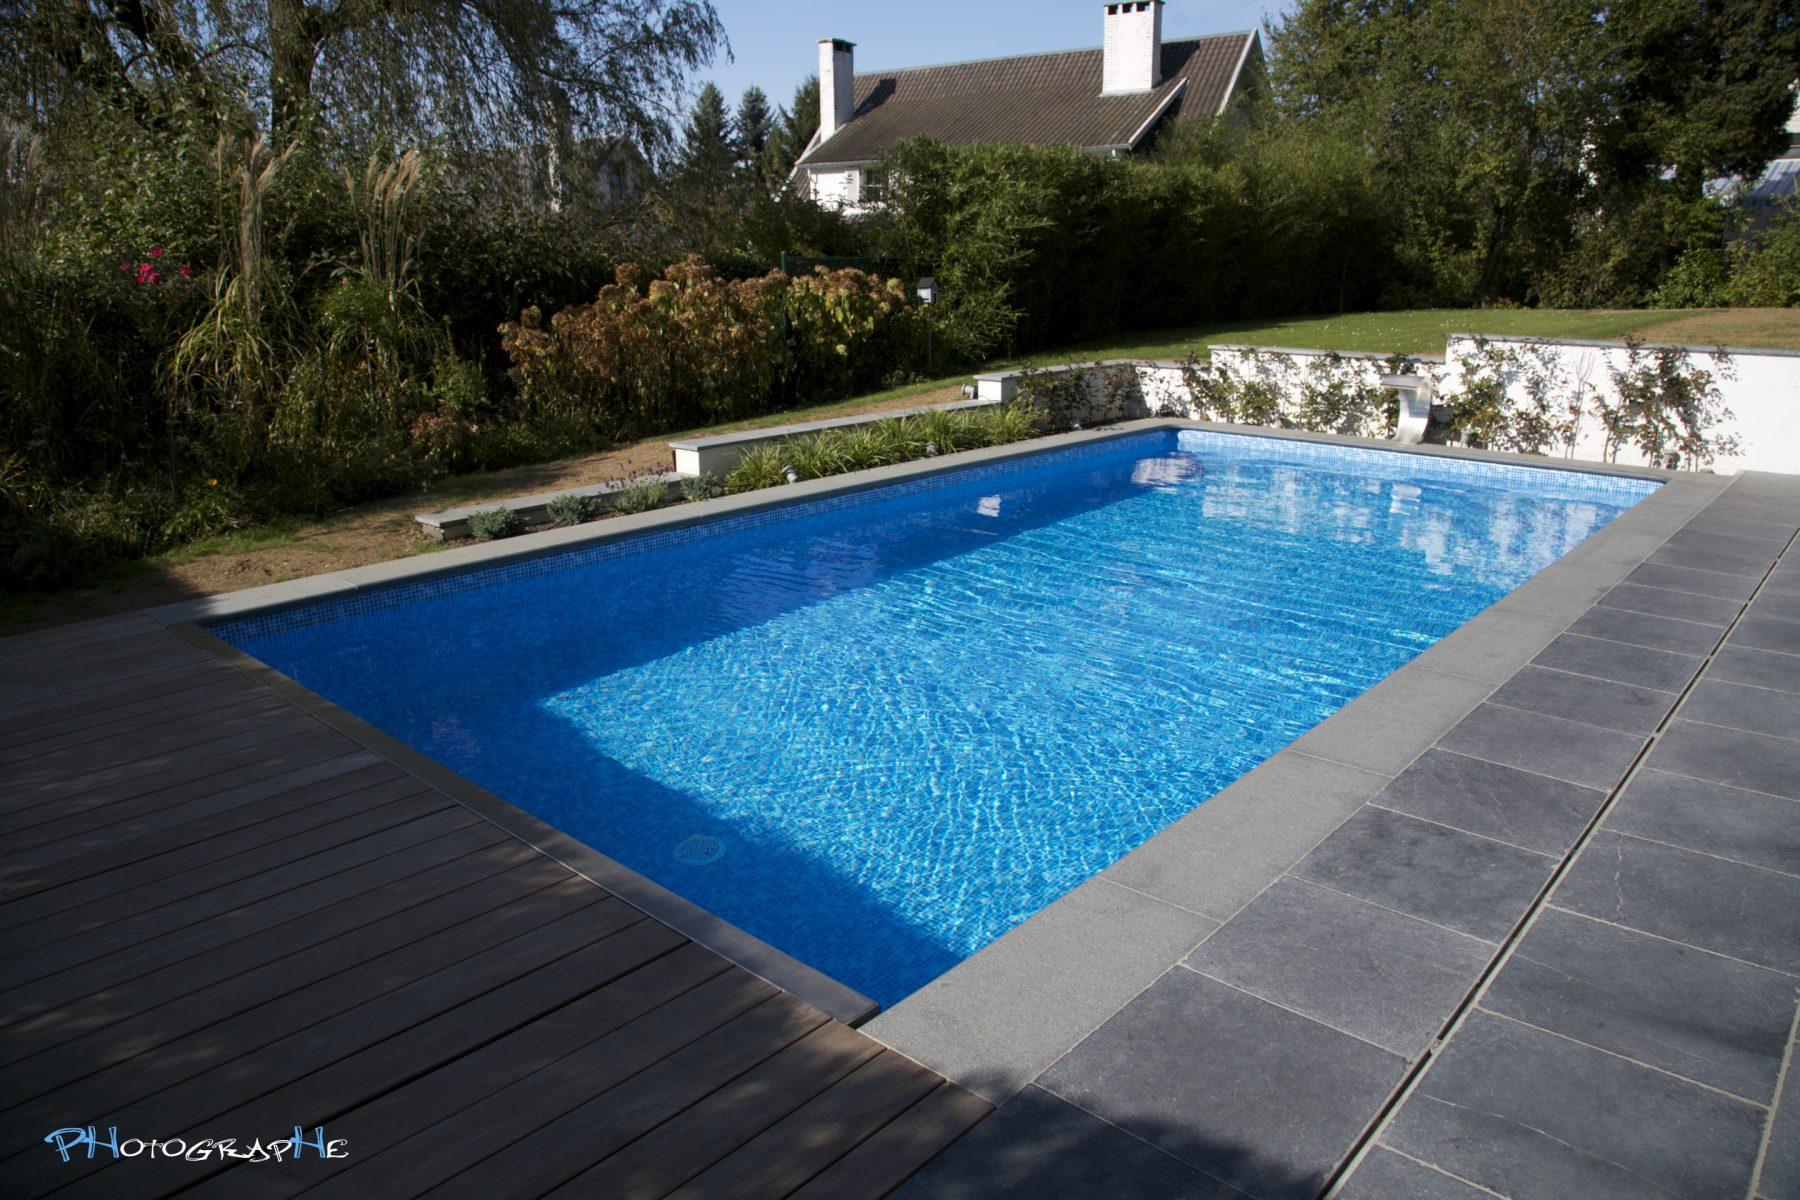 Piscines nage zen piscines et wellness for Accessoire piscine namur